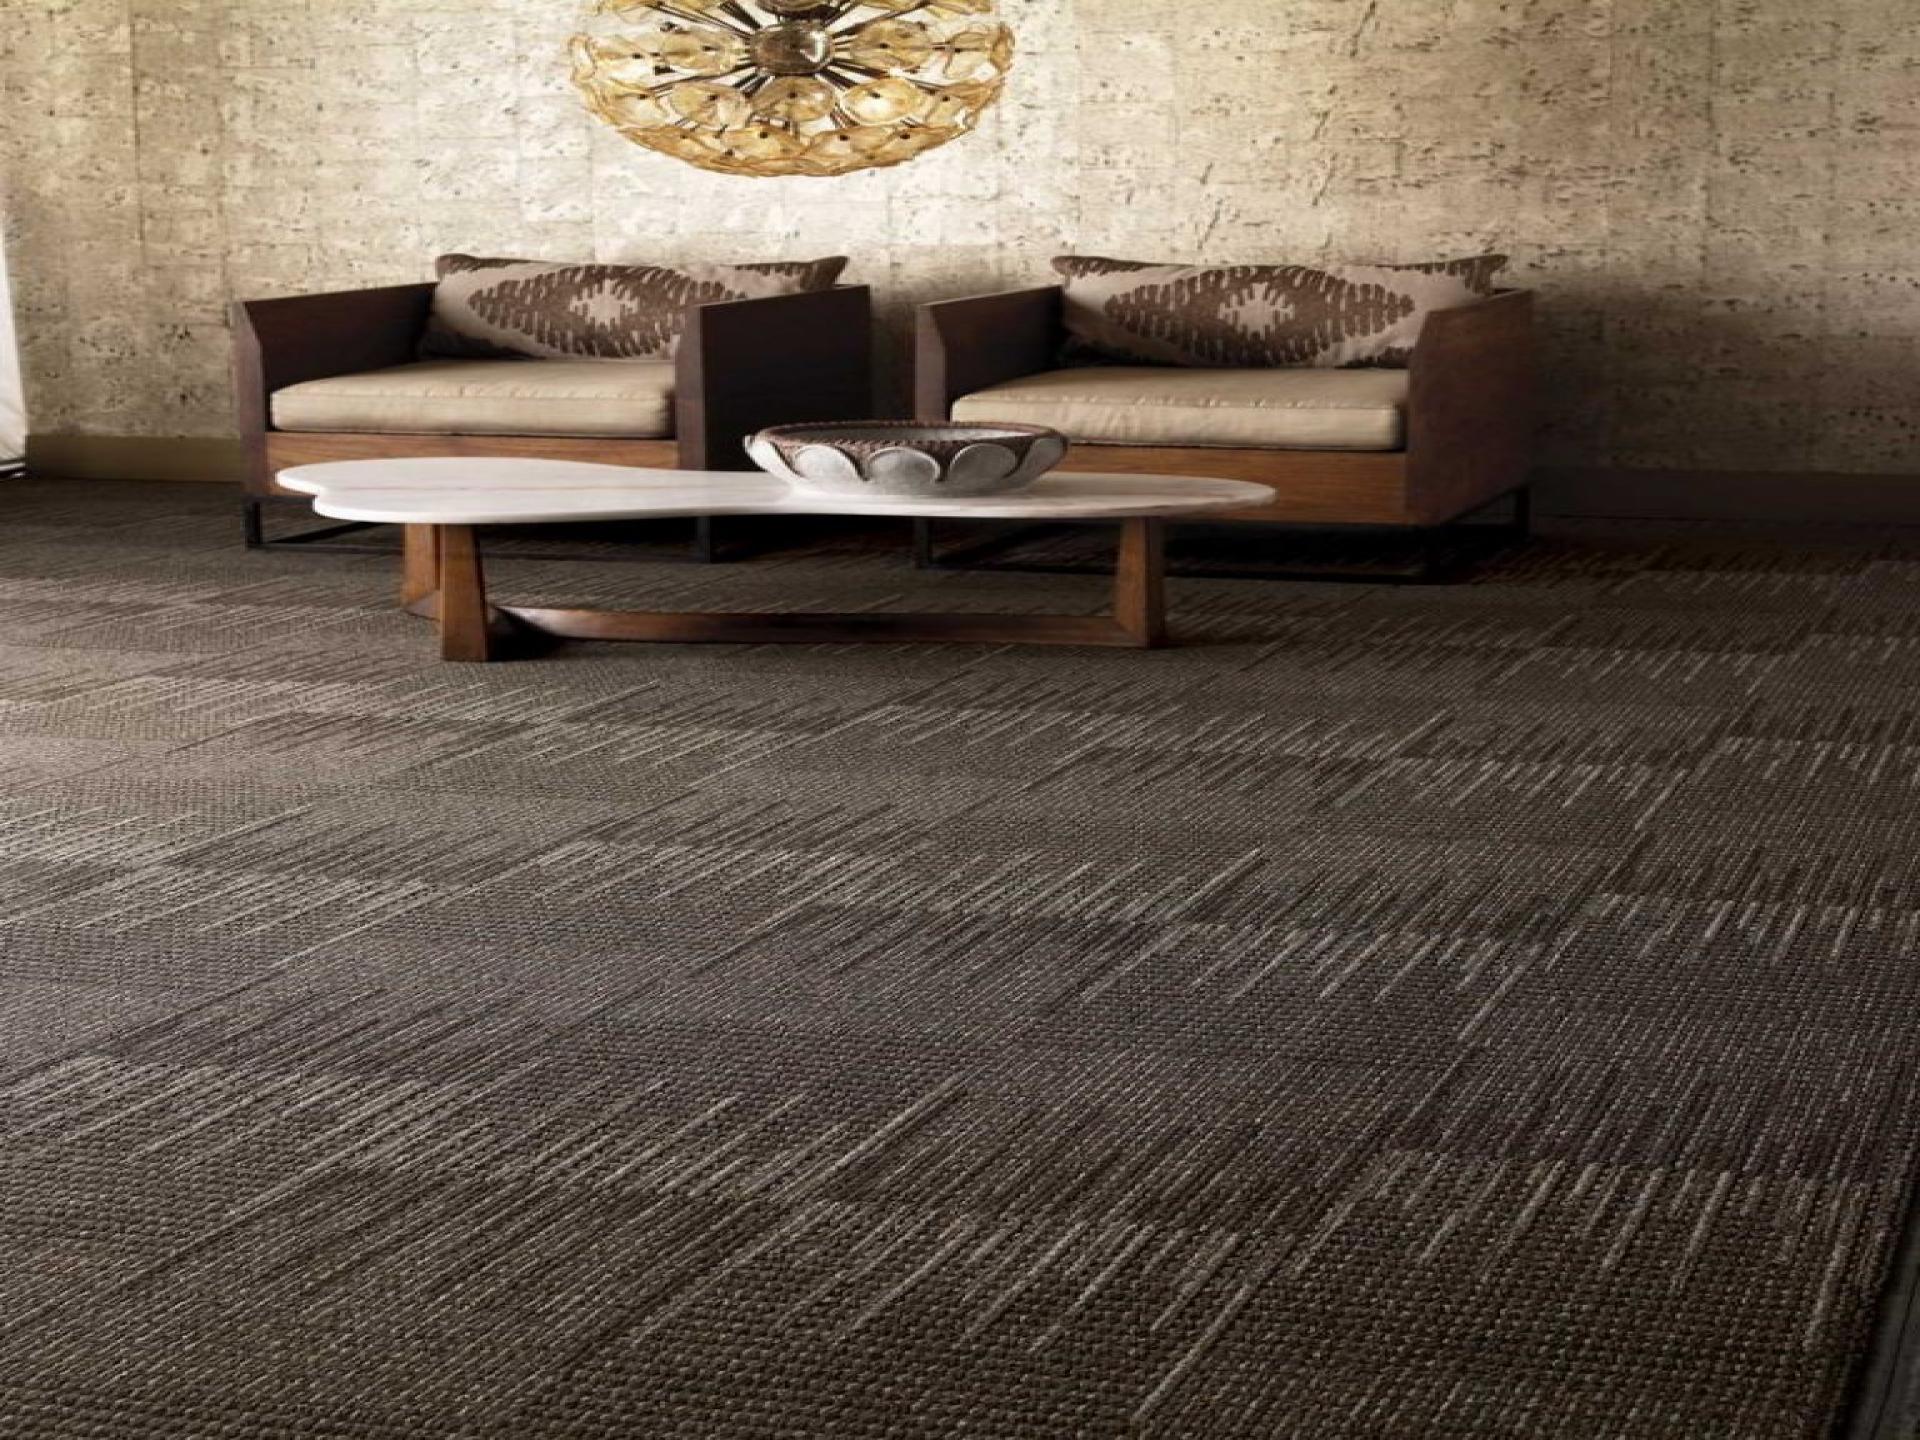 Best Carpet Tiles For A Basement